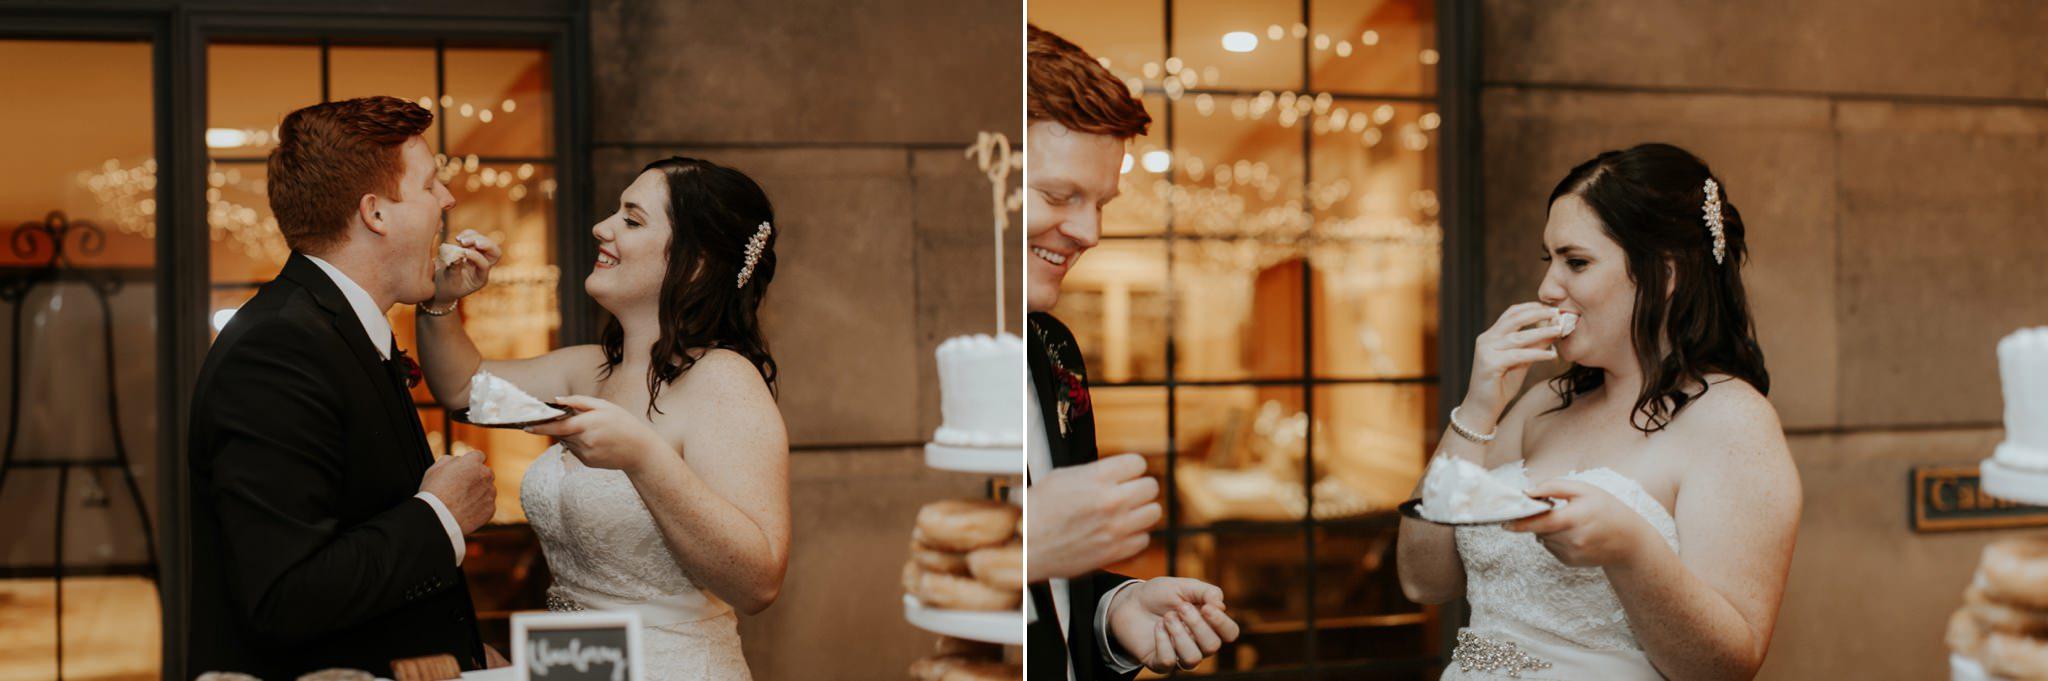 17-09-15 Lindsey and Brandon Wedding Edited-881_WEB.jpg